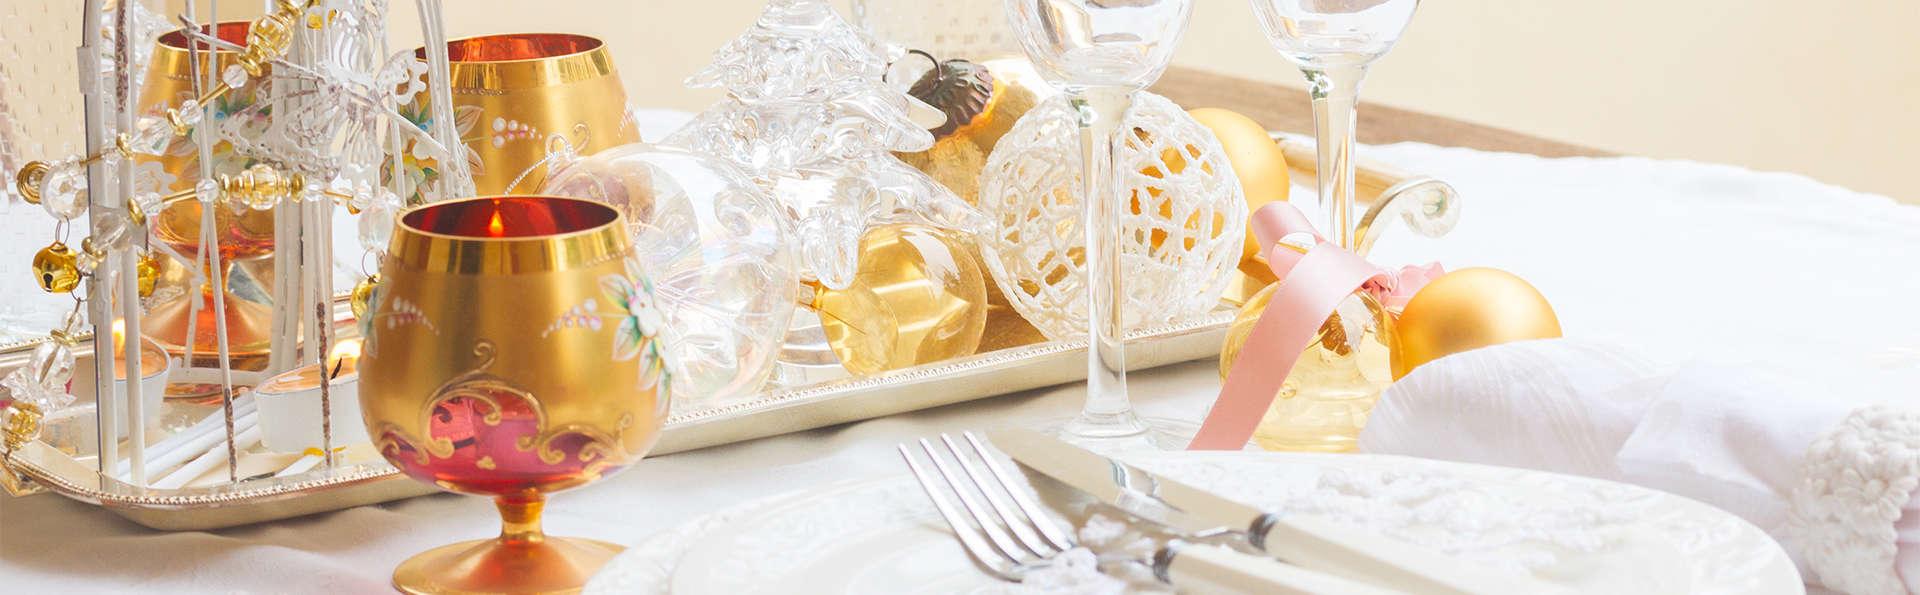 Douro Royal Valley Hotel & Spa - EDIT_Food.jpg